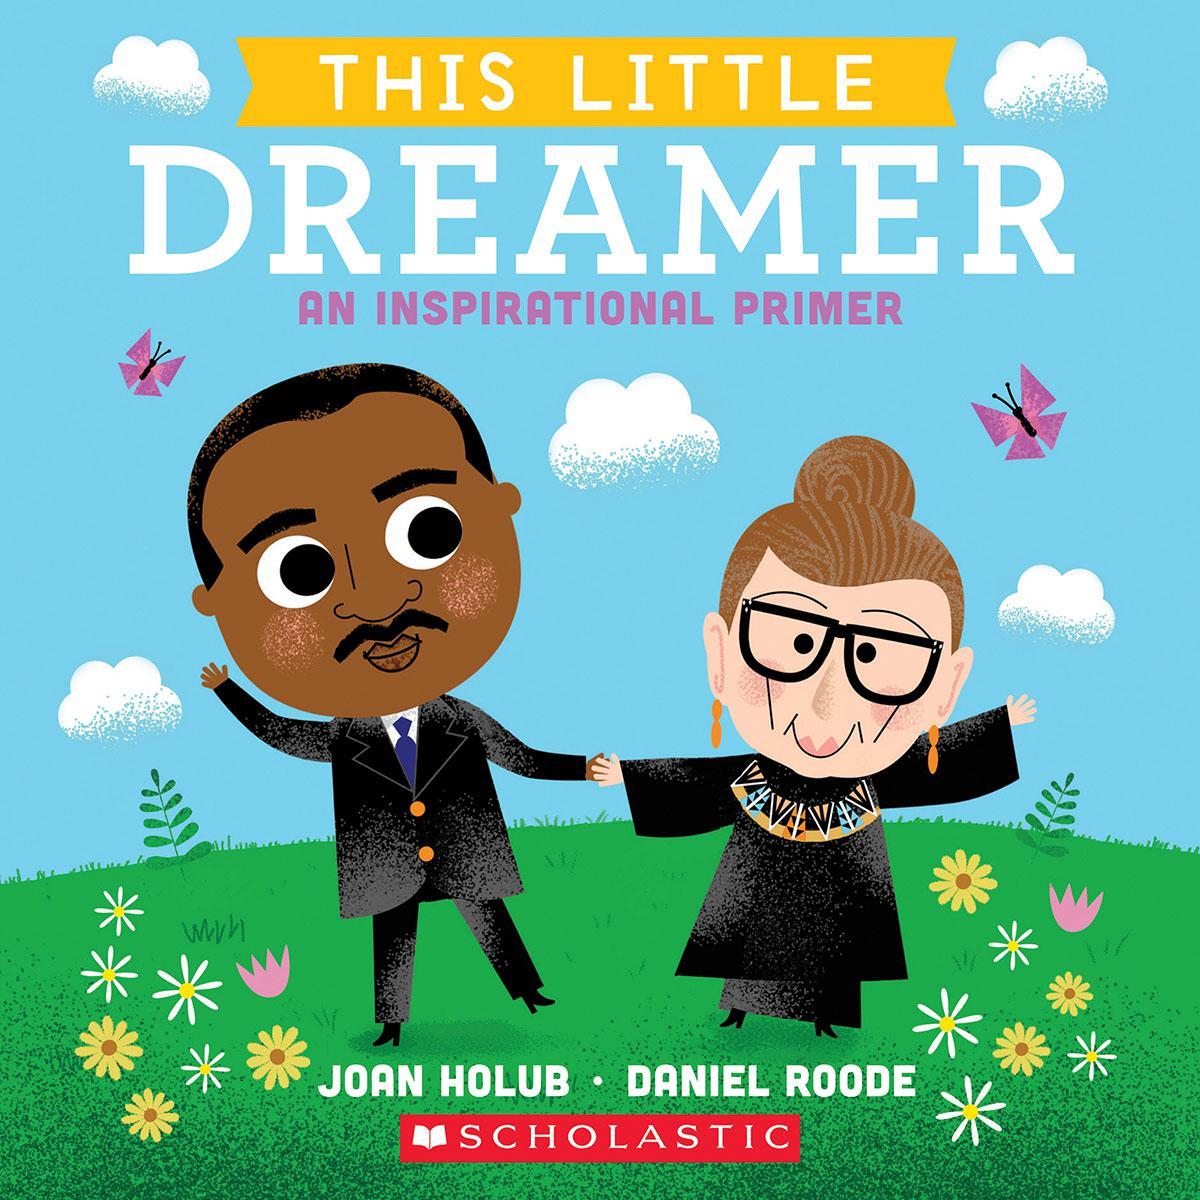 This Little Dreamer: An Inspirational Primer